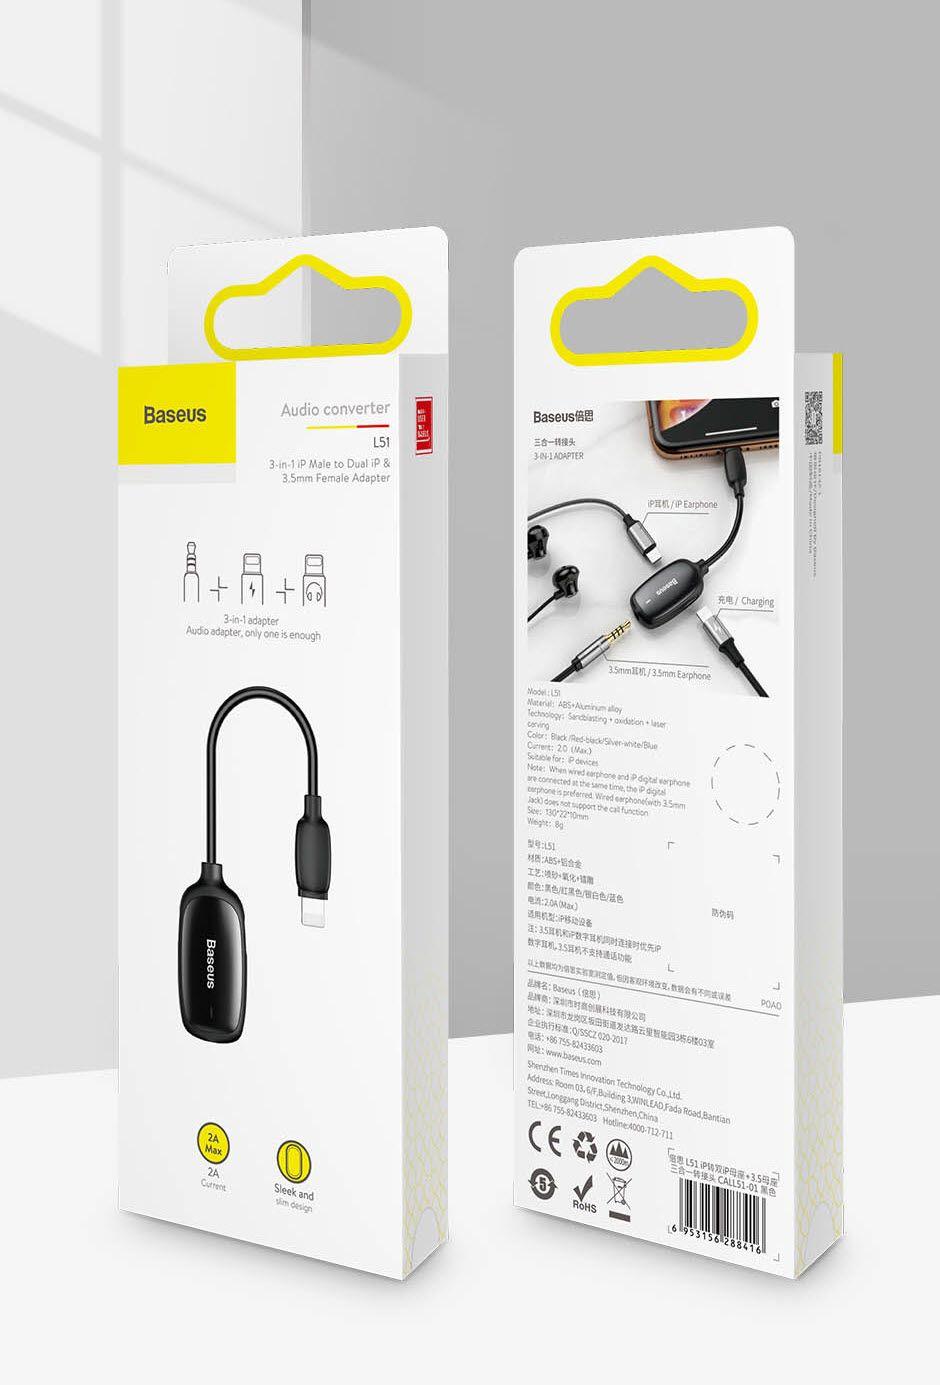 Baseus Audio Converter L51 Lightning To 2x Lightning And Headphones Jack (11)